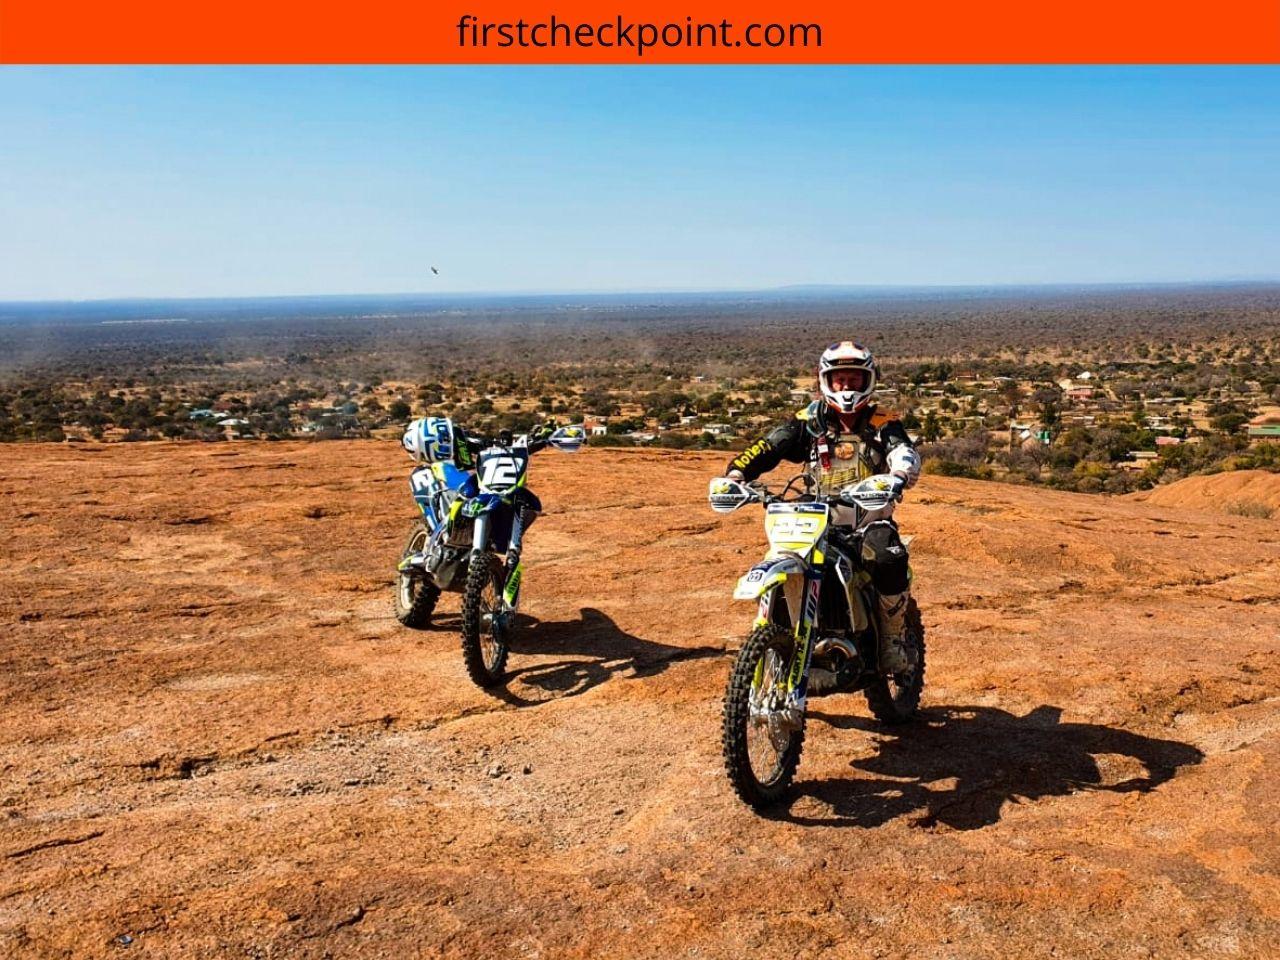 Dirt Bike Setup and Mods Tall Riders